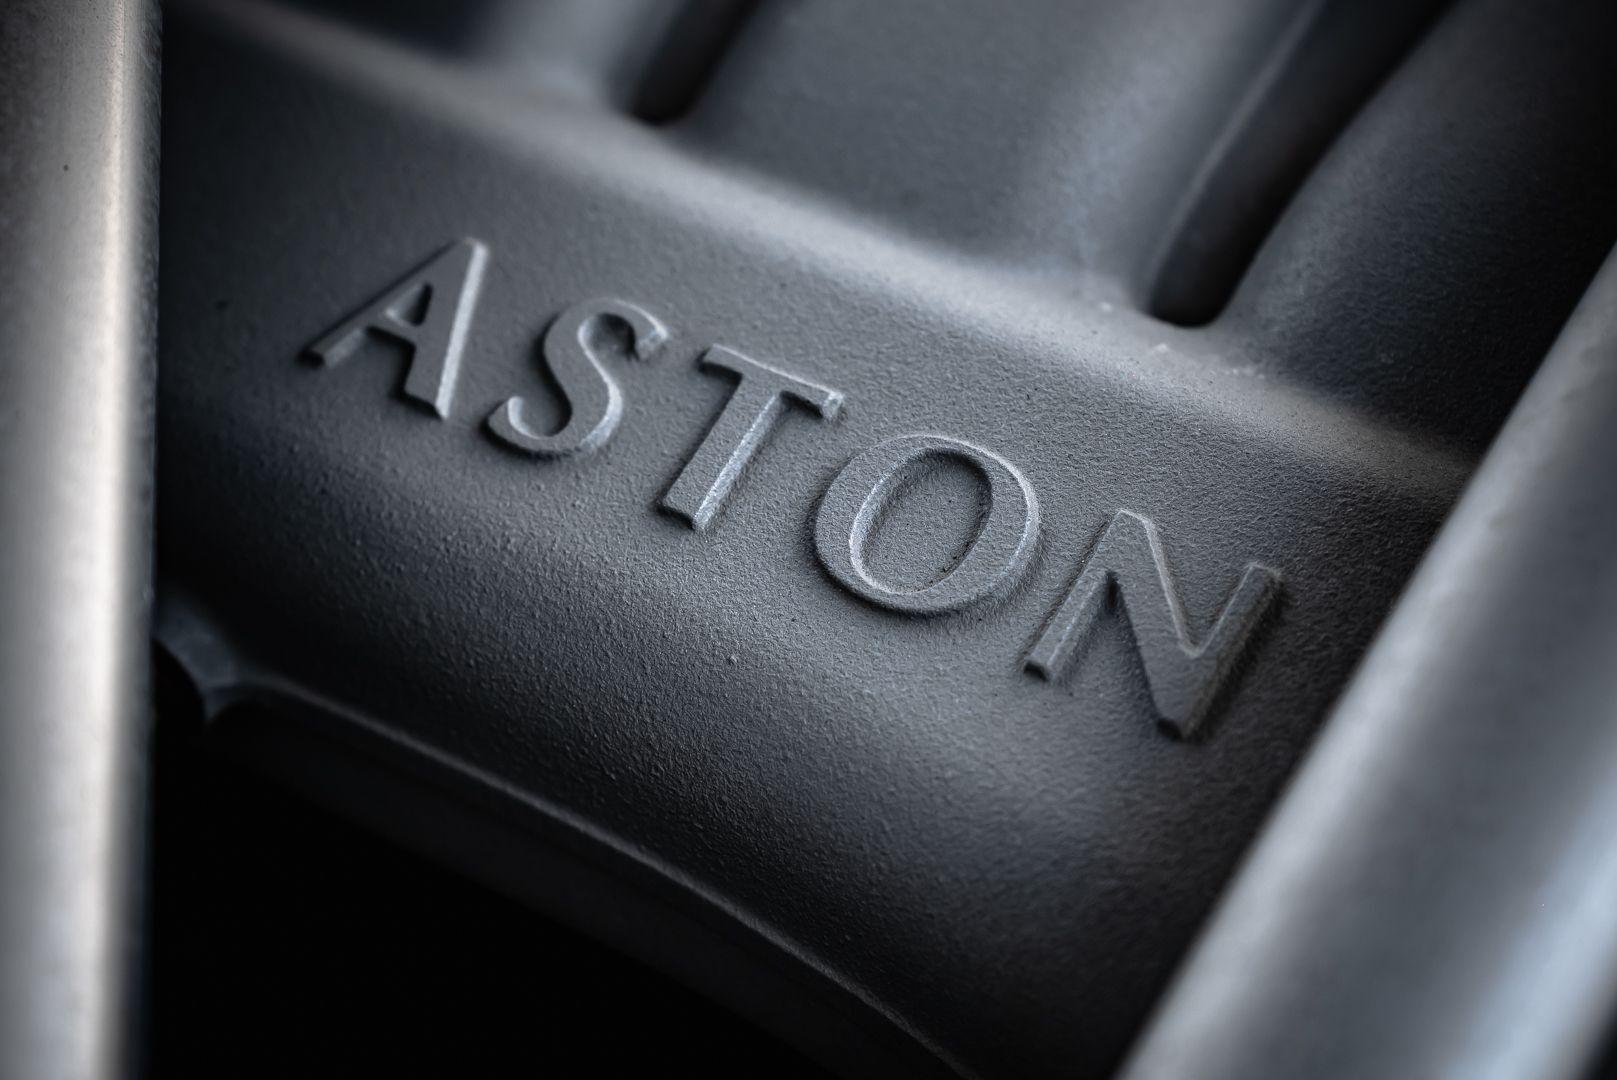 2010 Aston Martin Rapide 6.0 V12 62626